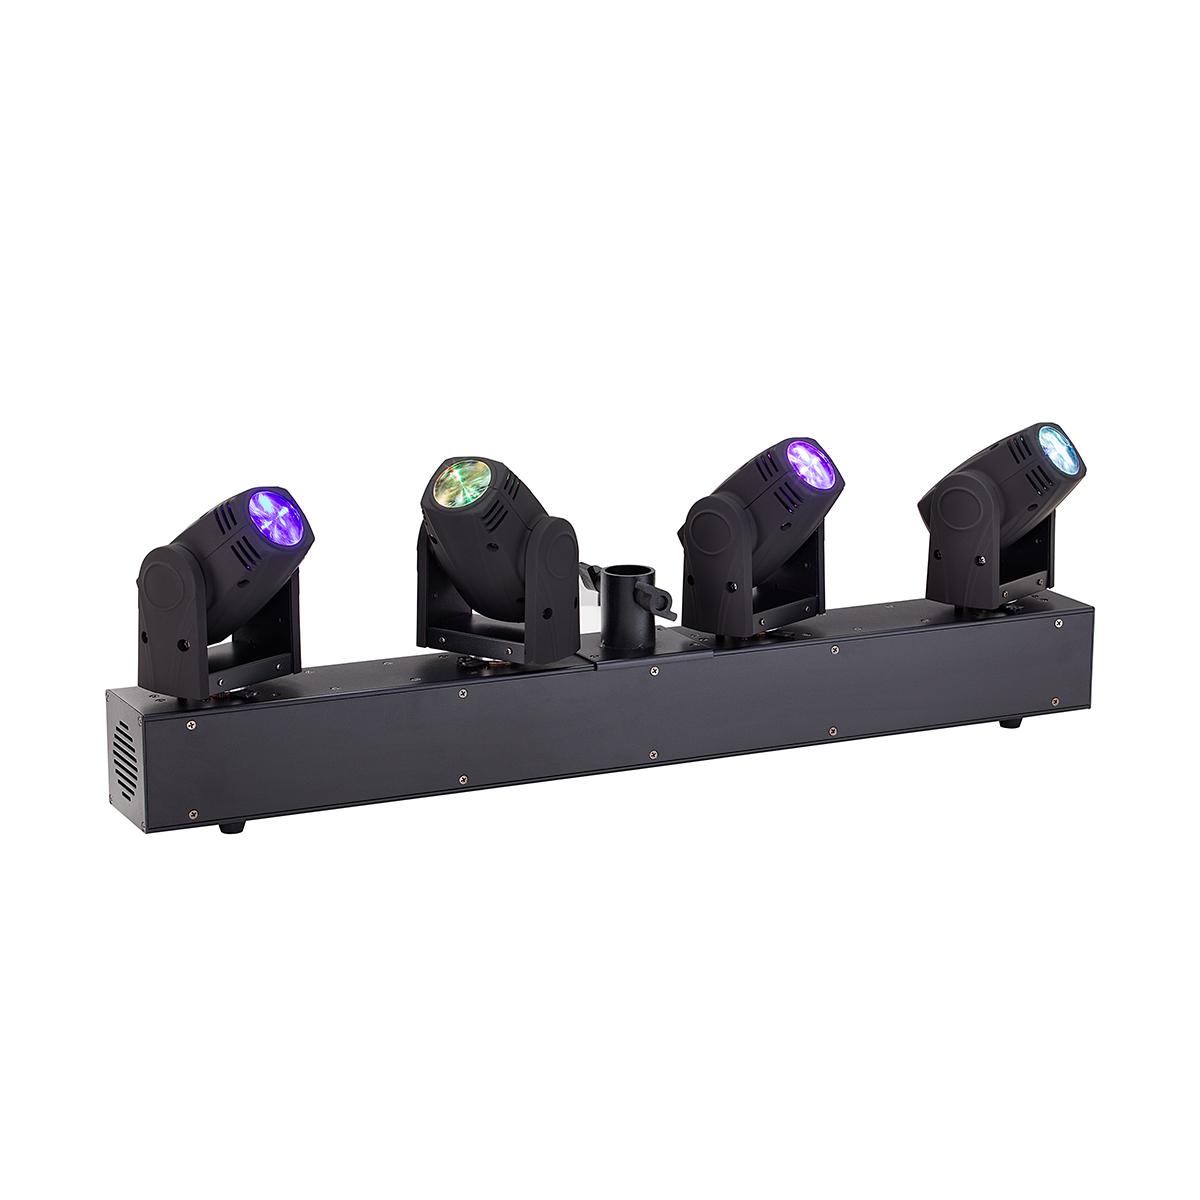 BARRA 4 TESTE MOBILI LED BEAM SOUNDSATION MHL-4H-BAR 4x10W RGBW CREE